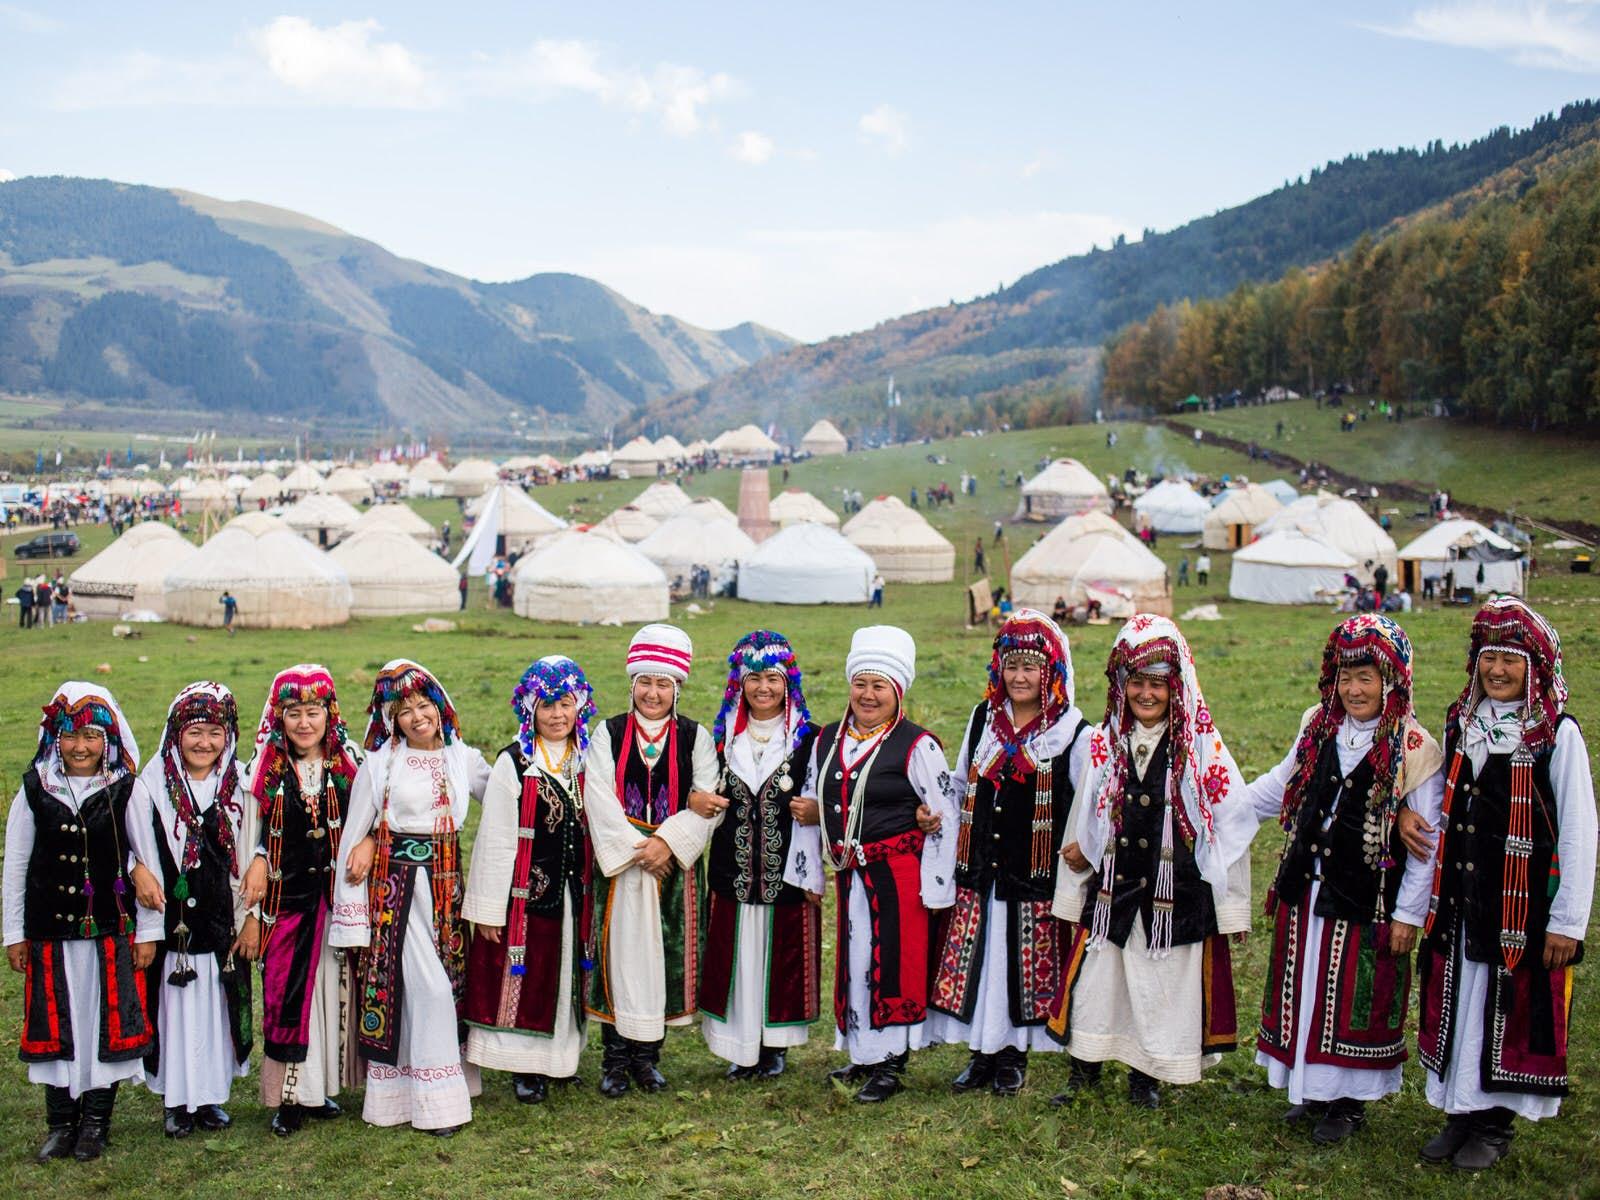 world-nomad-games-kyrgyzstan1-9b925c7fee